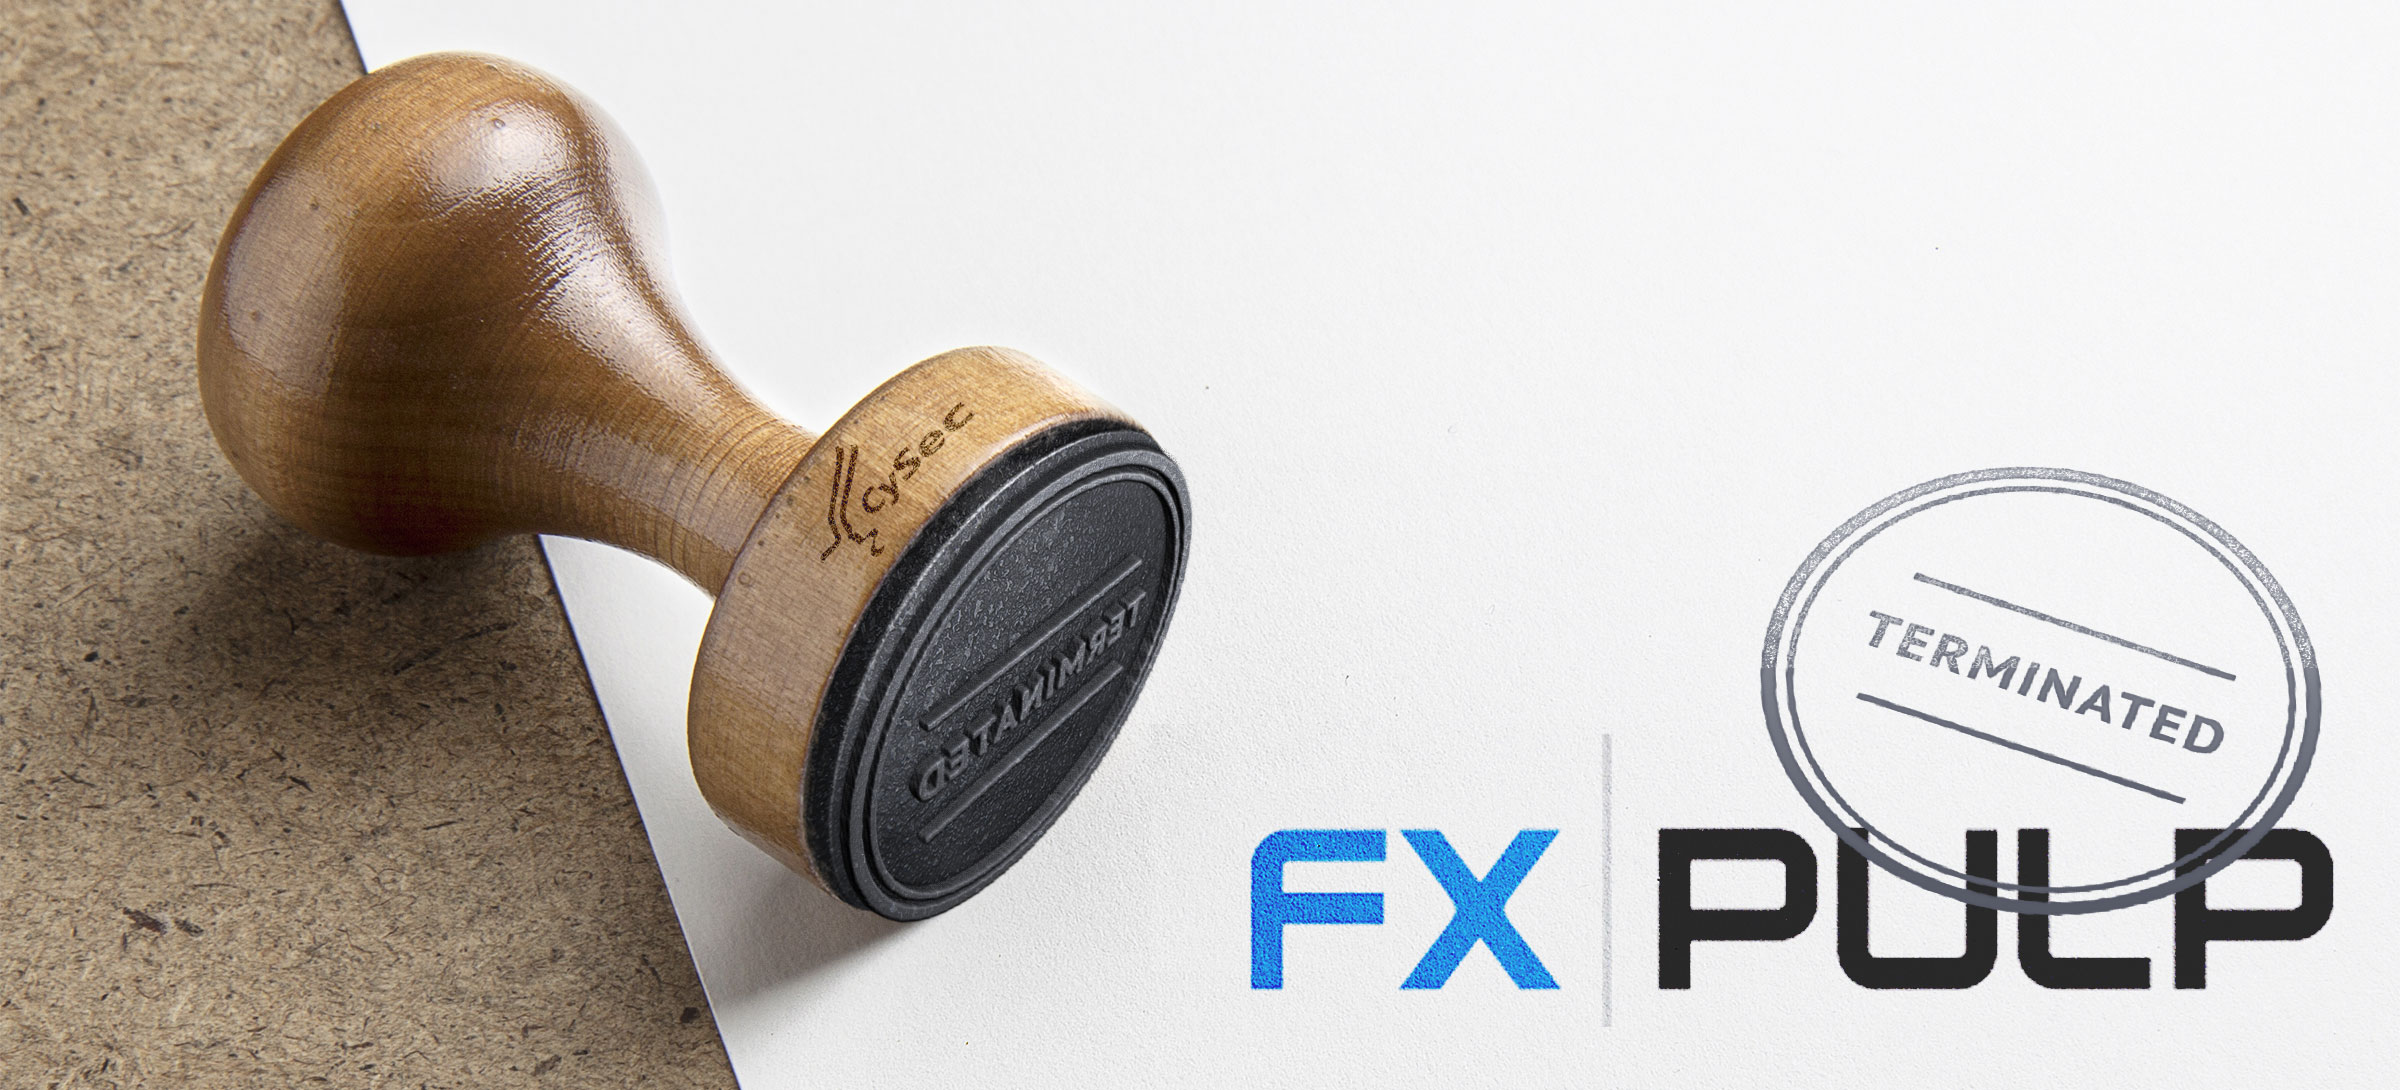 fxpulp, cysec, icf, investor compensation fund